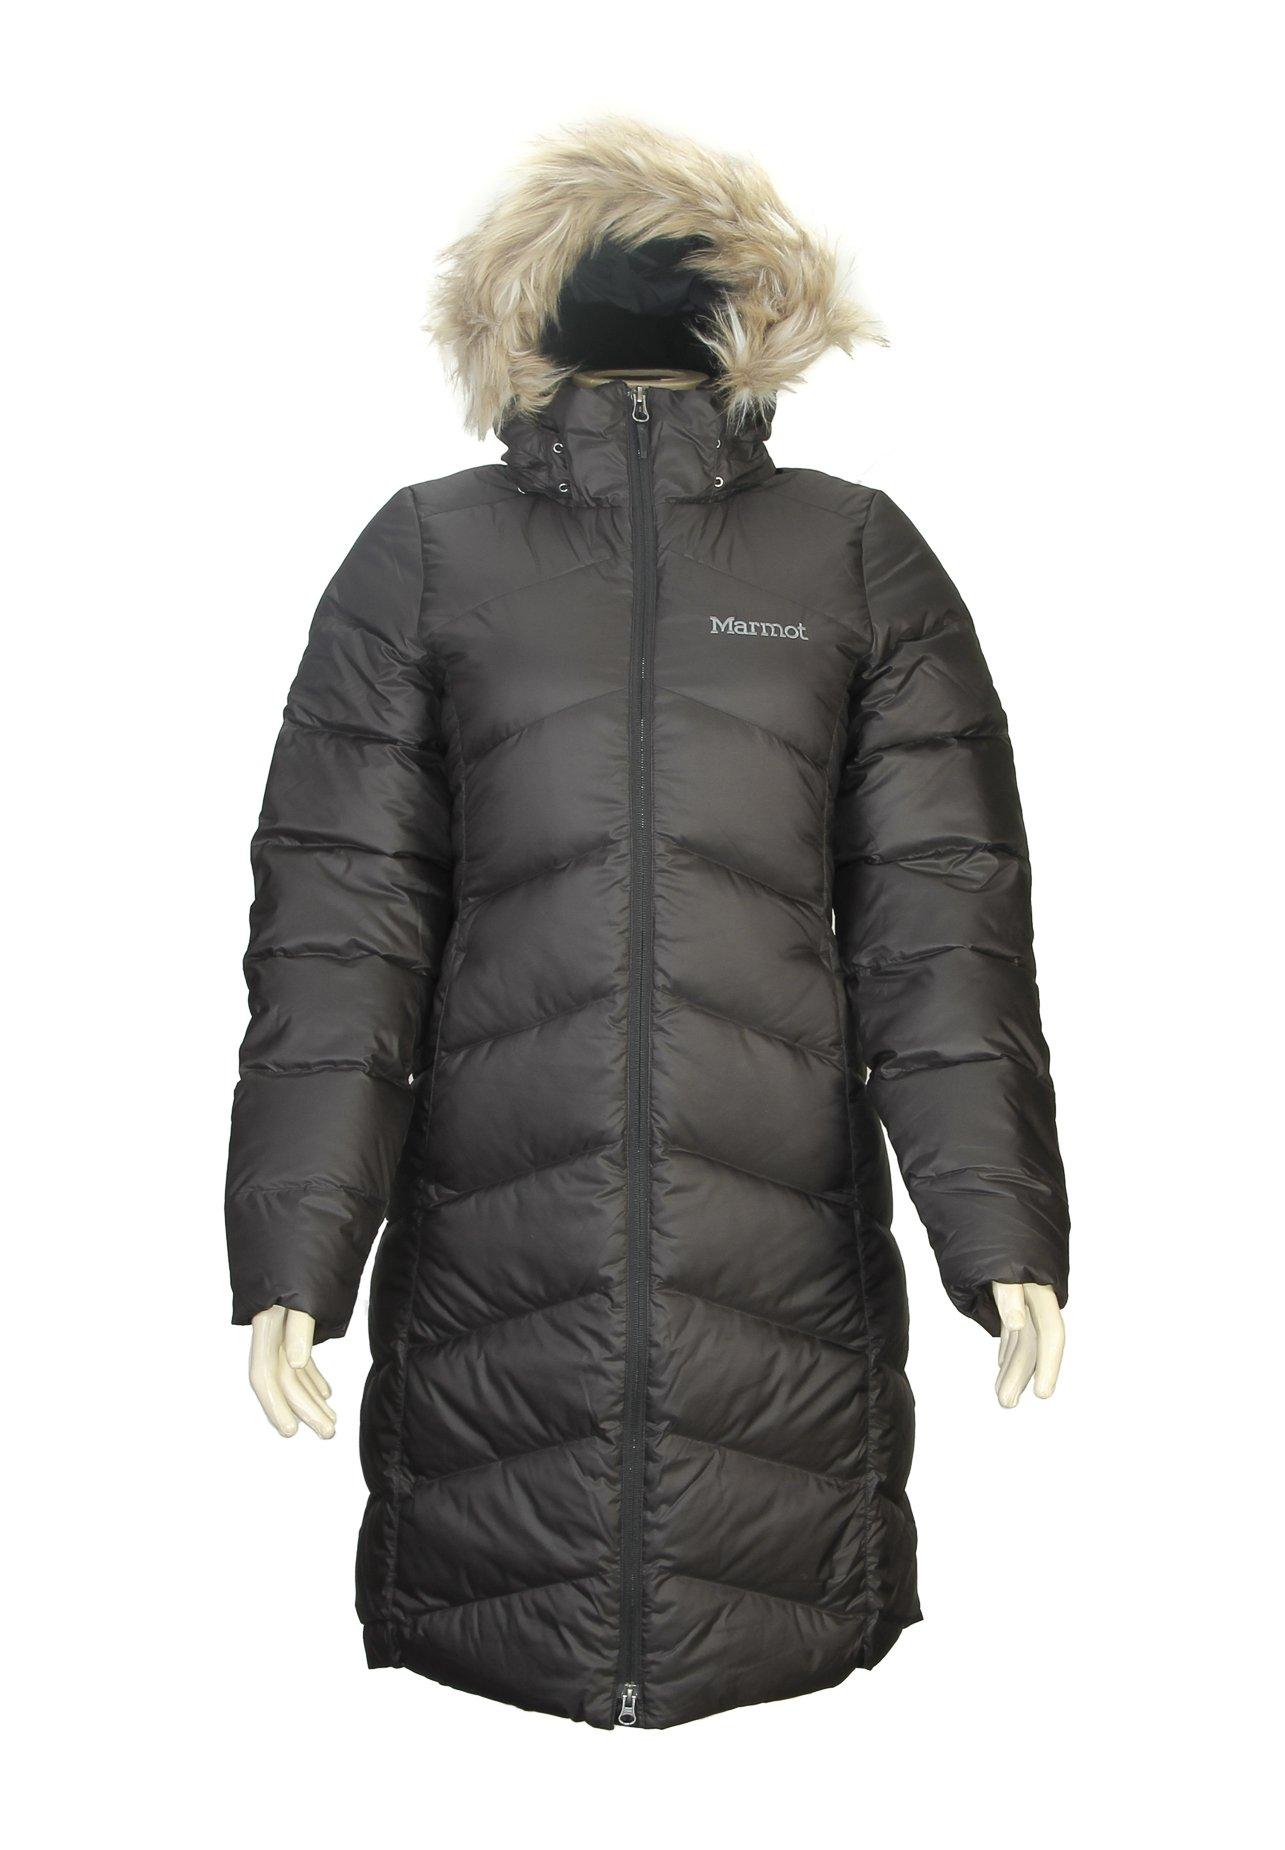 Marmot Womens  Montreaux Down Coat - Medium - Black